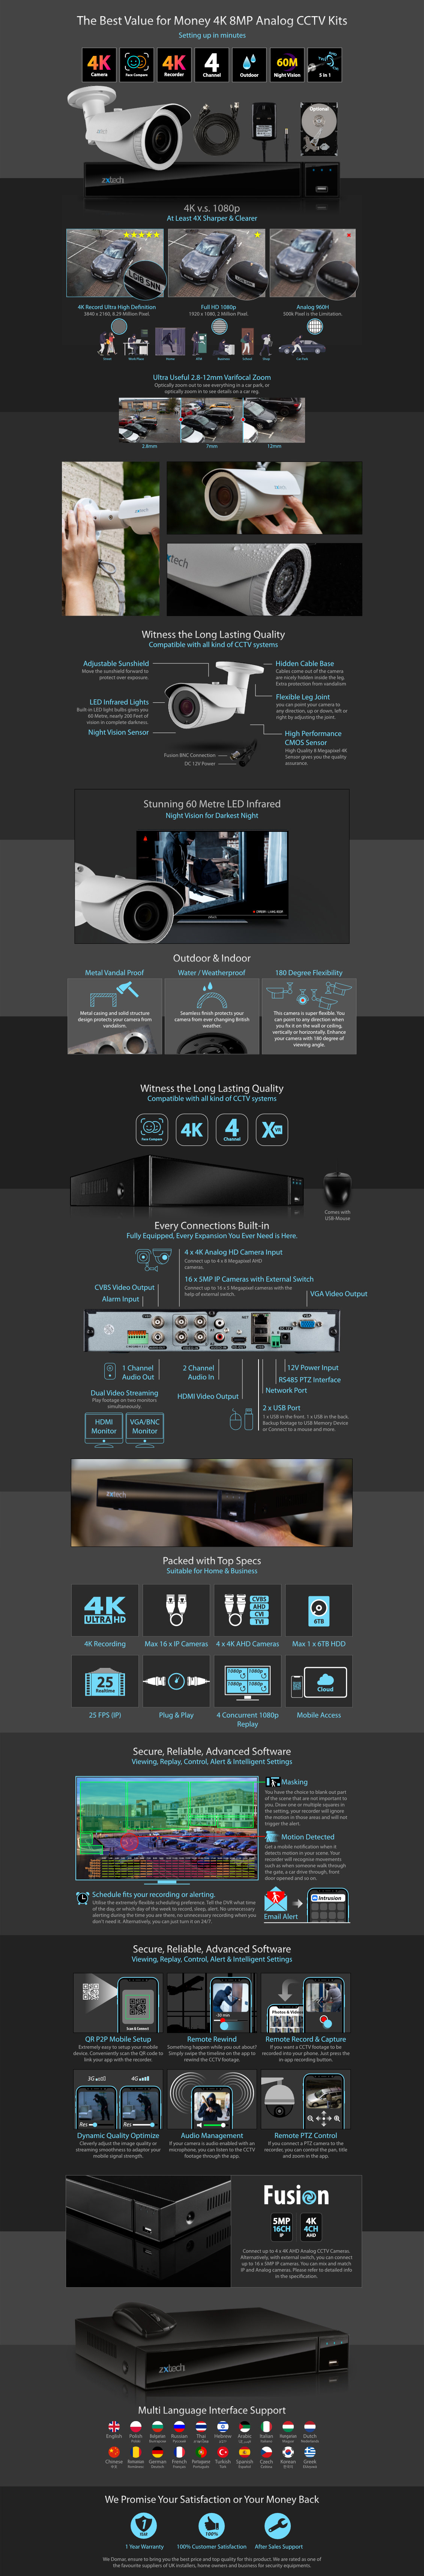 Zxtech 1x 8MP 4K-Lite UHD 60M Night Vision 2.8-12mm Varifocal Bullet Camera 4CH DVR CCTV Kit | AX1F4Z